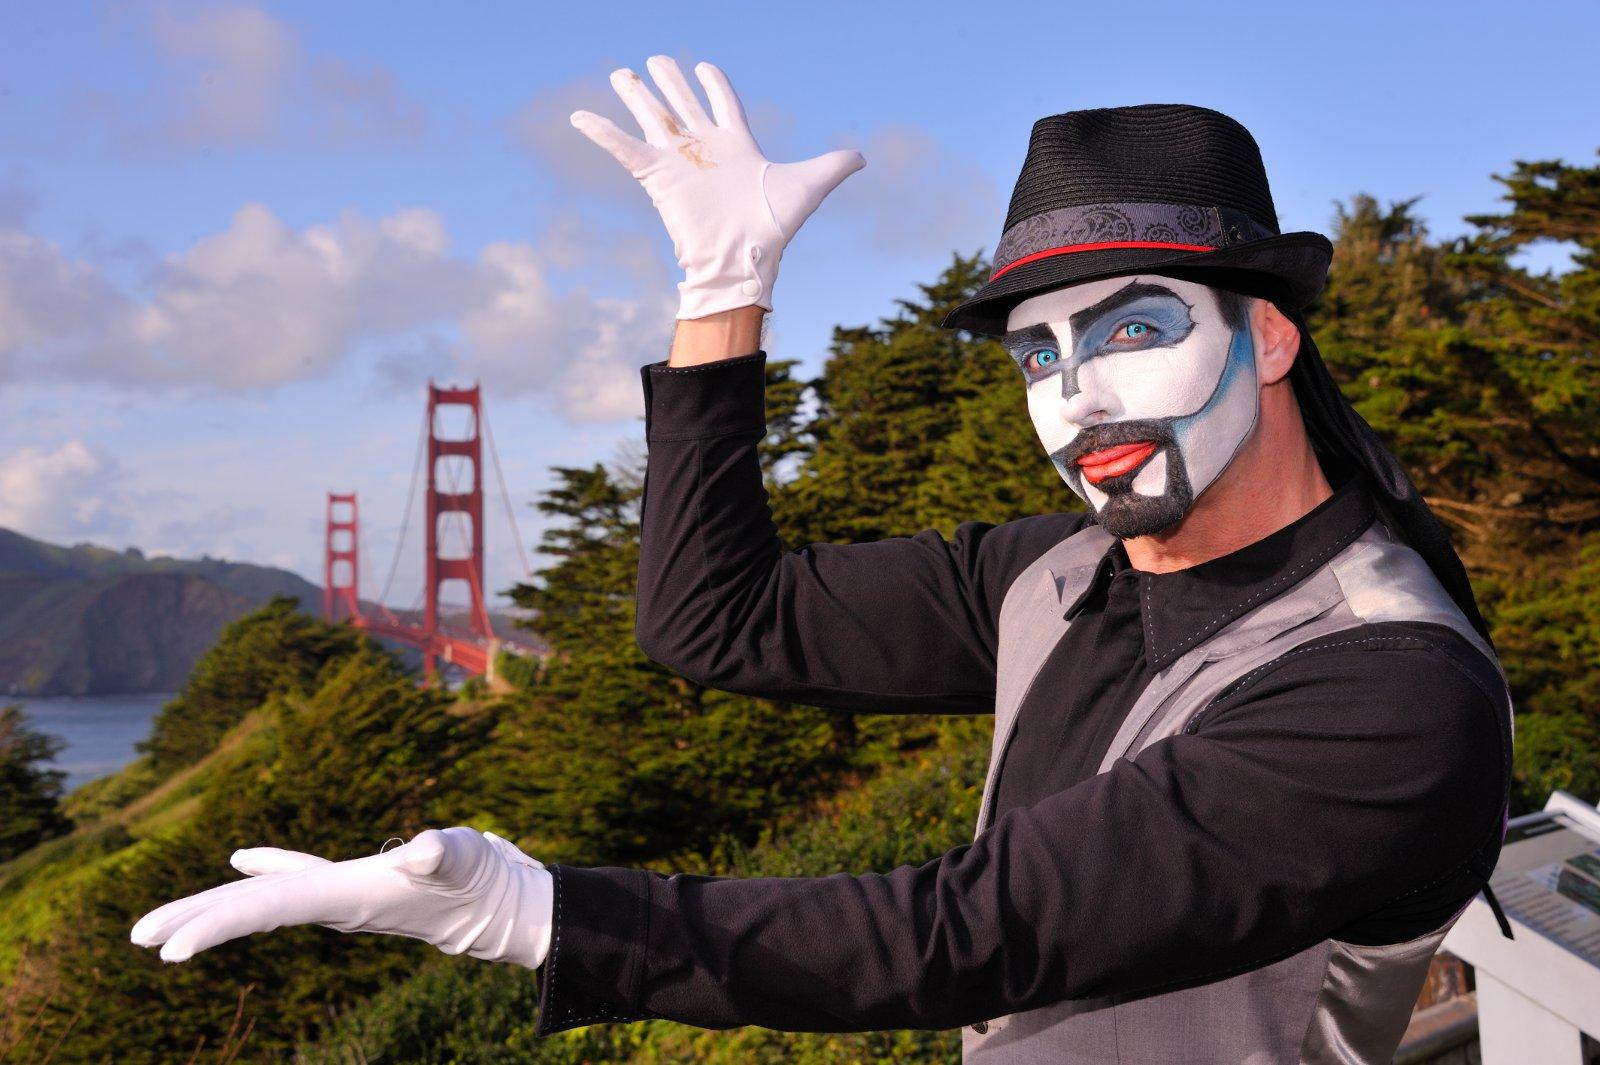 Nikon Af S Nikkor 28 300mm F 35 56g Ed Vr Lens 55 45 Picture Shows A Street Performer With The Golden Gate Bridge In Background